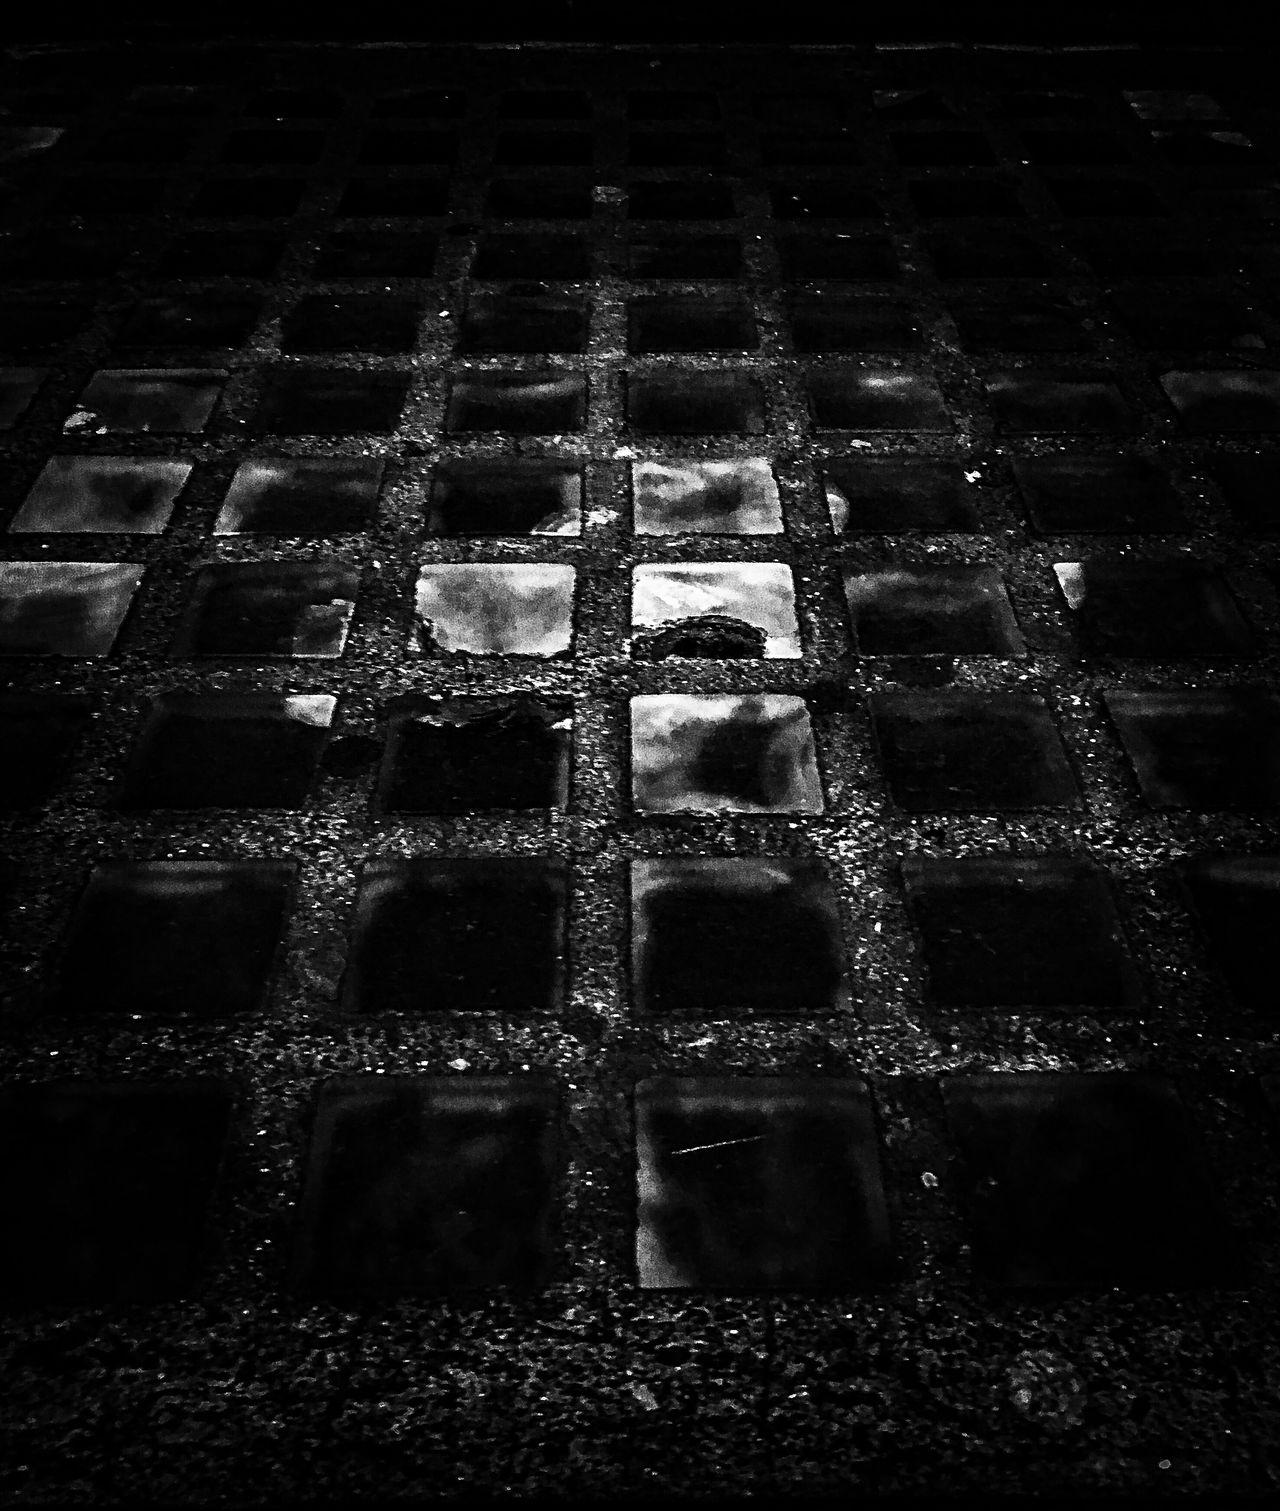 Glass Blocks Pavement Black And White London Streetphotography Urban Exploration Fine Art The Week Of Eyeem Showcase July Creative Photography Weathered Artistic Dark Mood